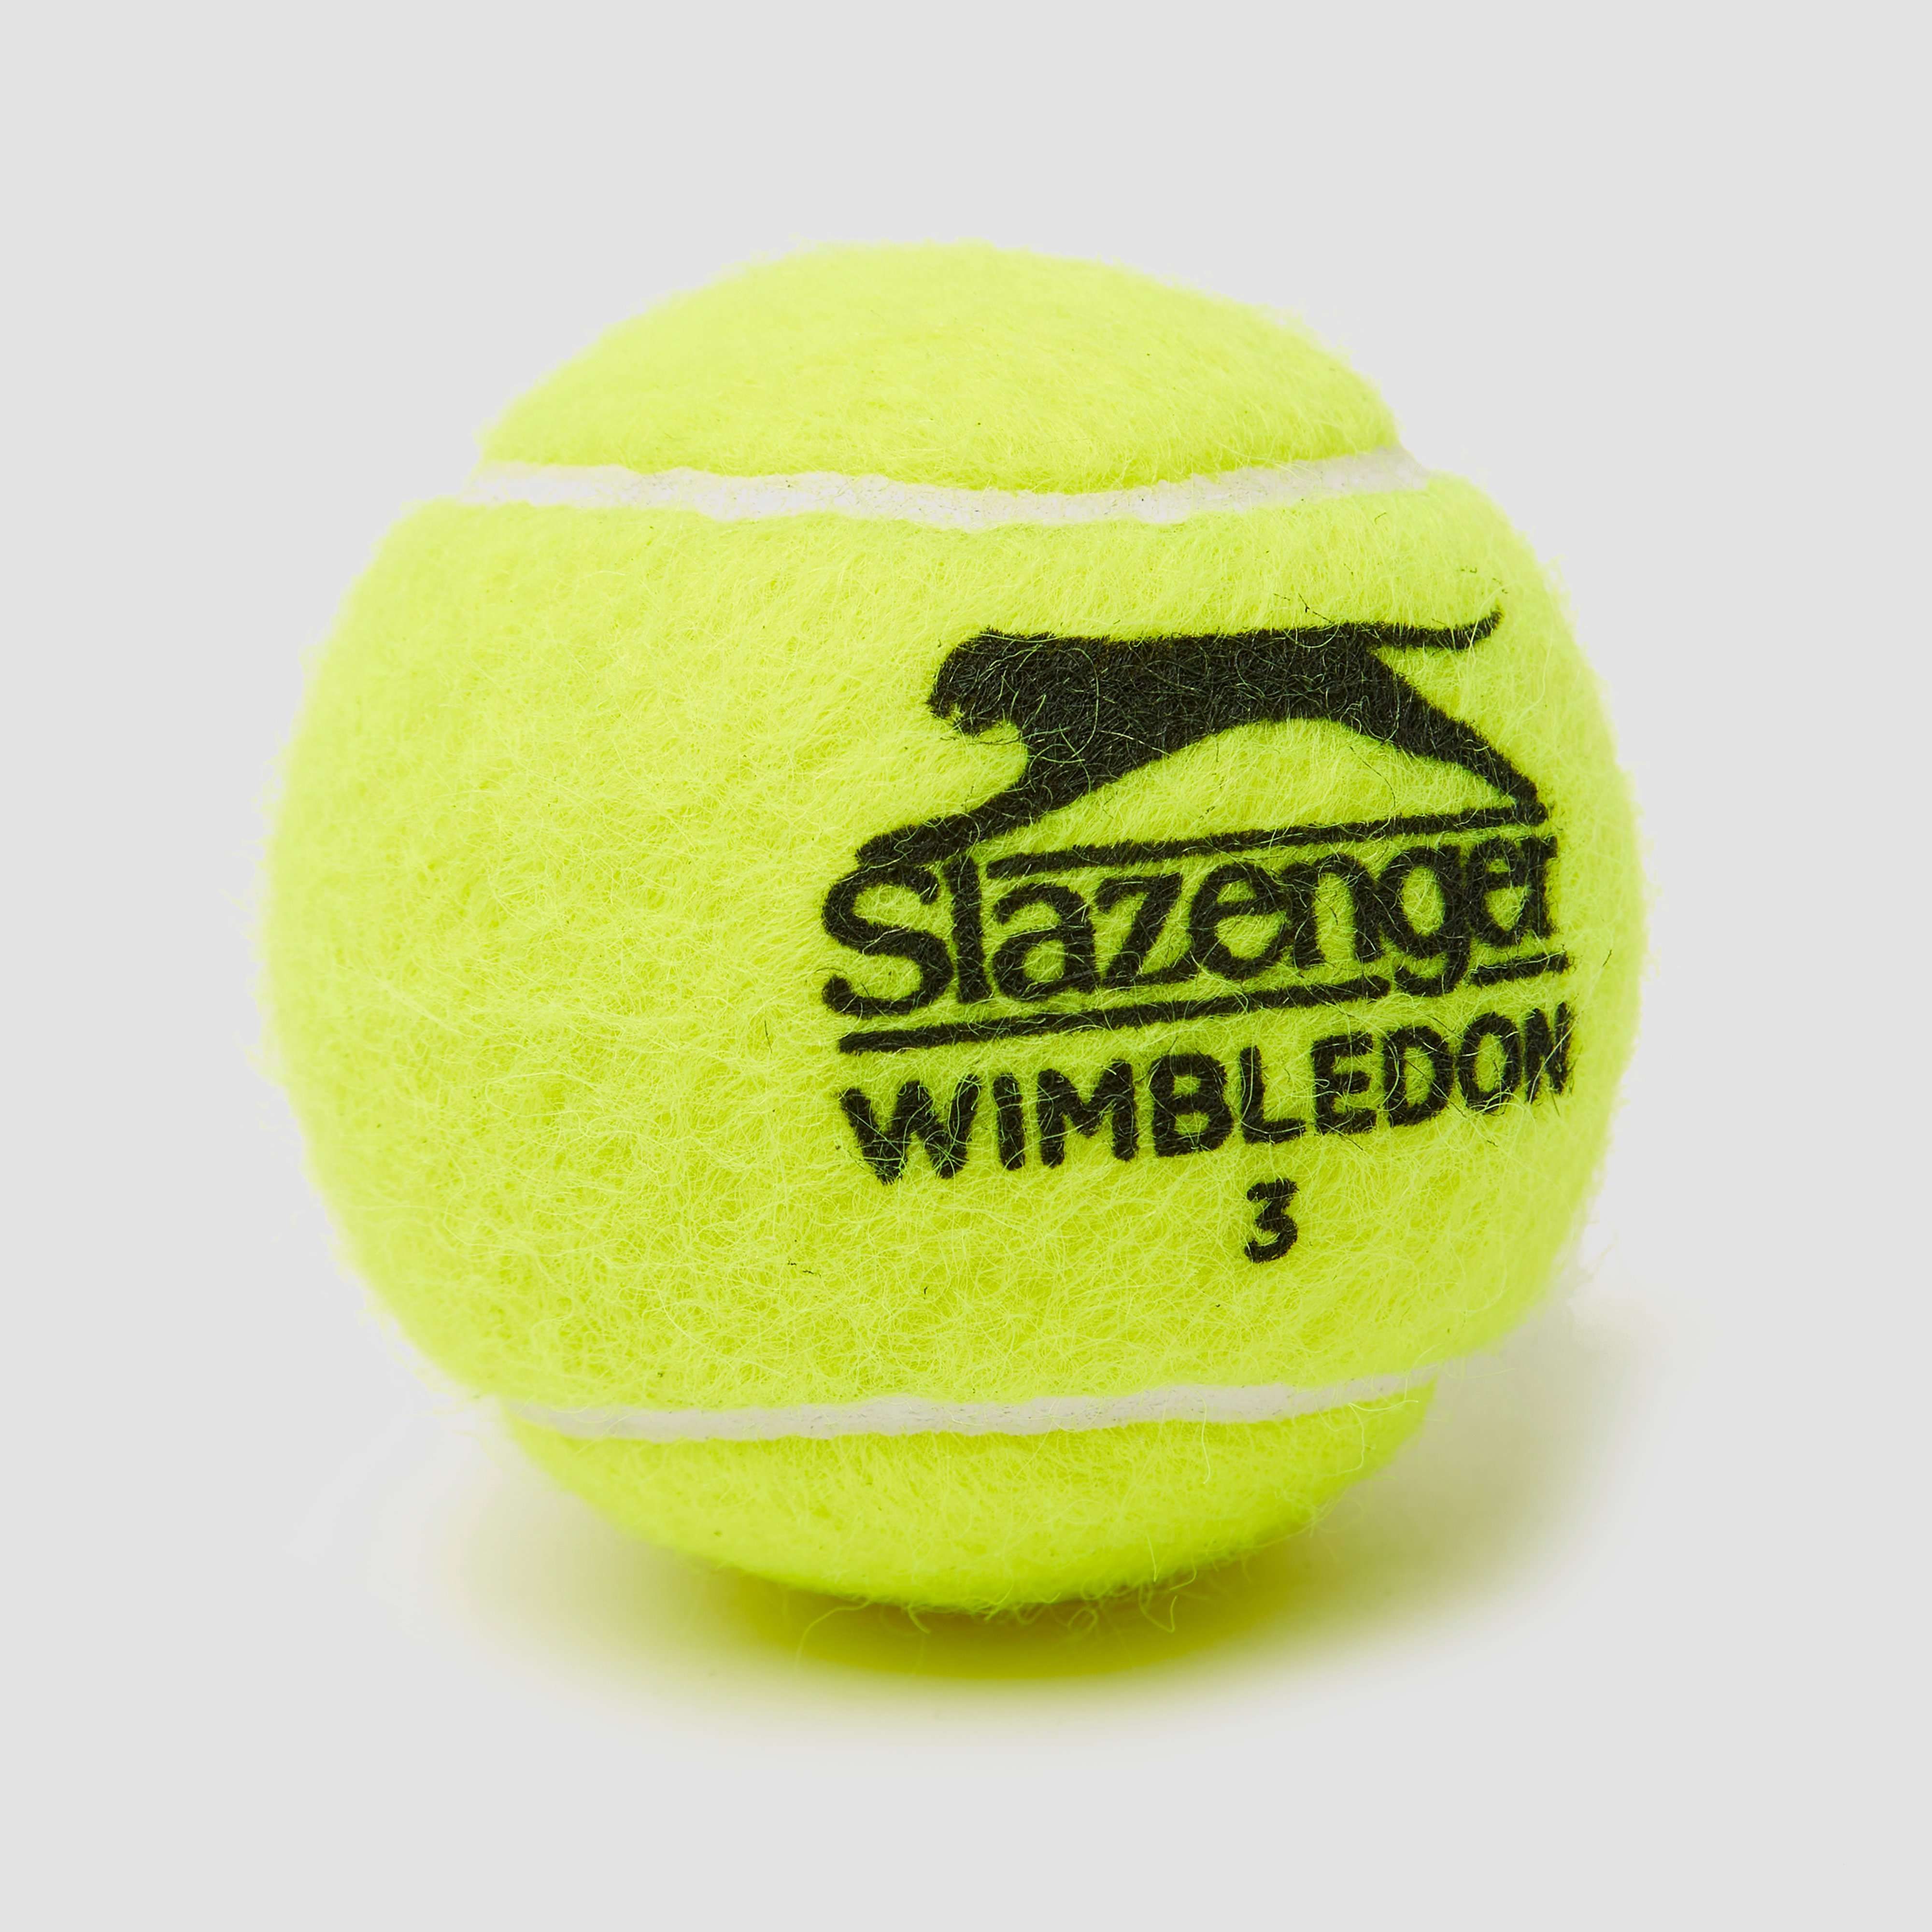 SLAZENGER WIMBLEDON TENNISBALLEN 3 STUKS